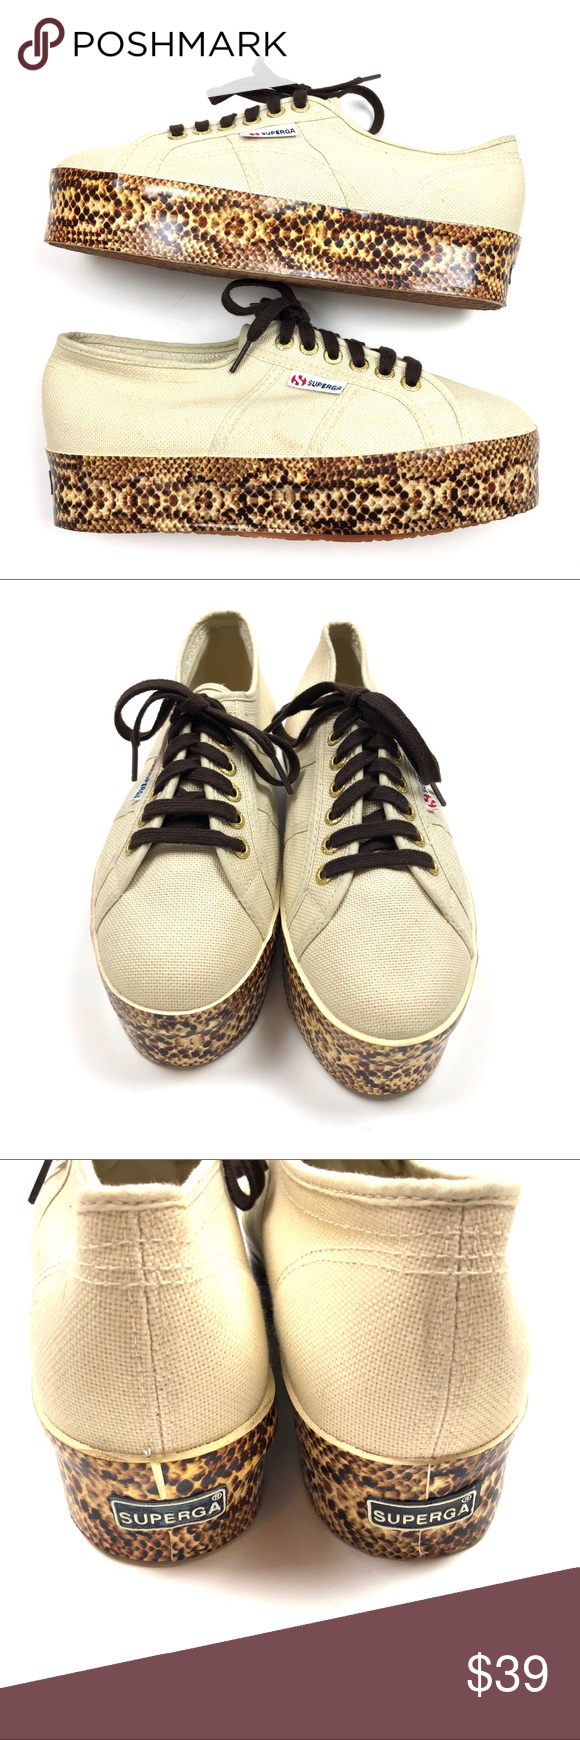 "Superga Viper Foxing Snakeskin Platform Sneakers 9 Superga 2790 Womens Ivory Viper Foxing Snakeskin Platform Sneakers Size 9  Platform is 2"" High  Excellent pre-owned condition. Superga Shoes Platforms"